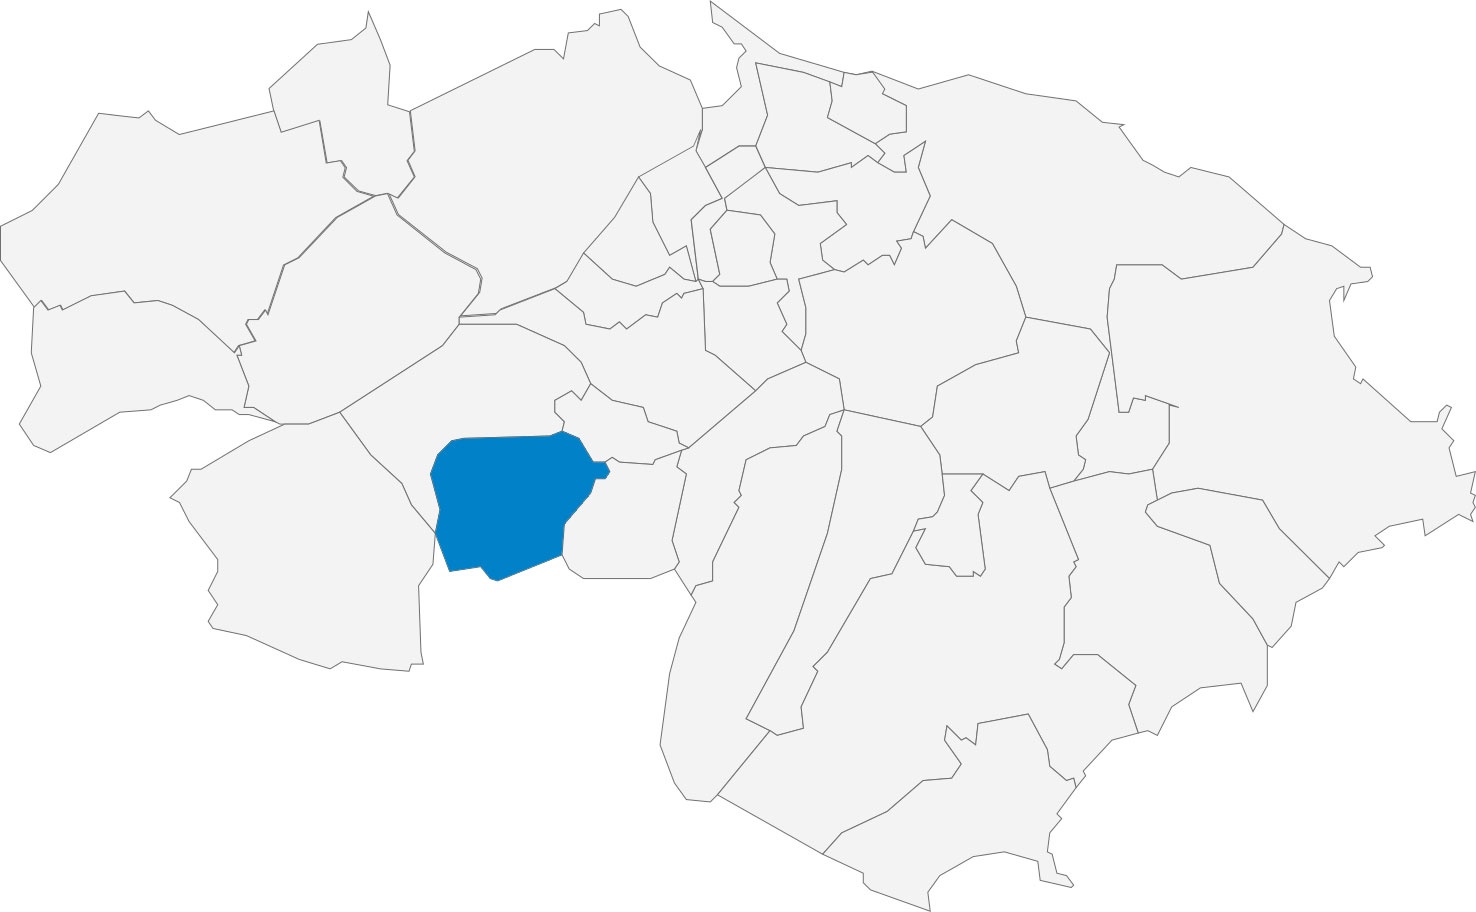 Benigembla